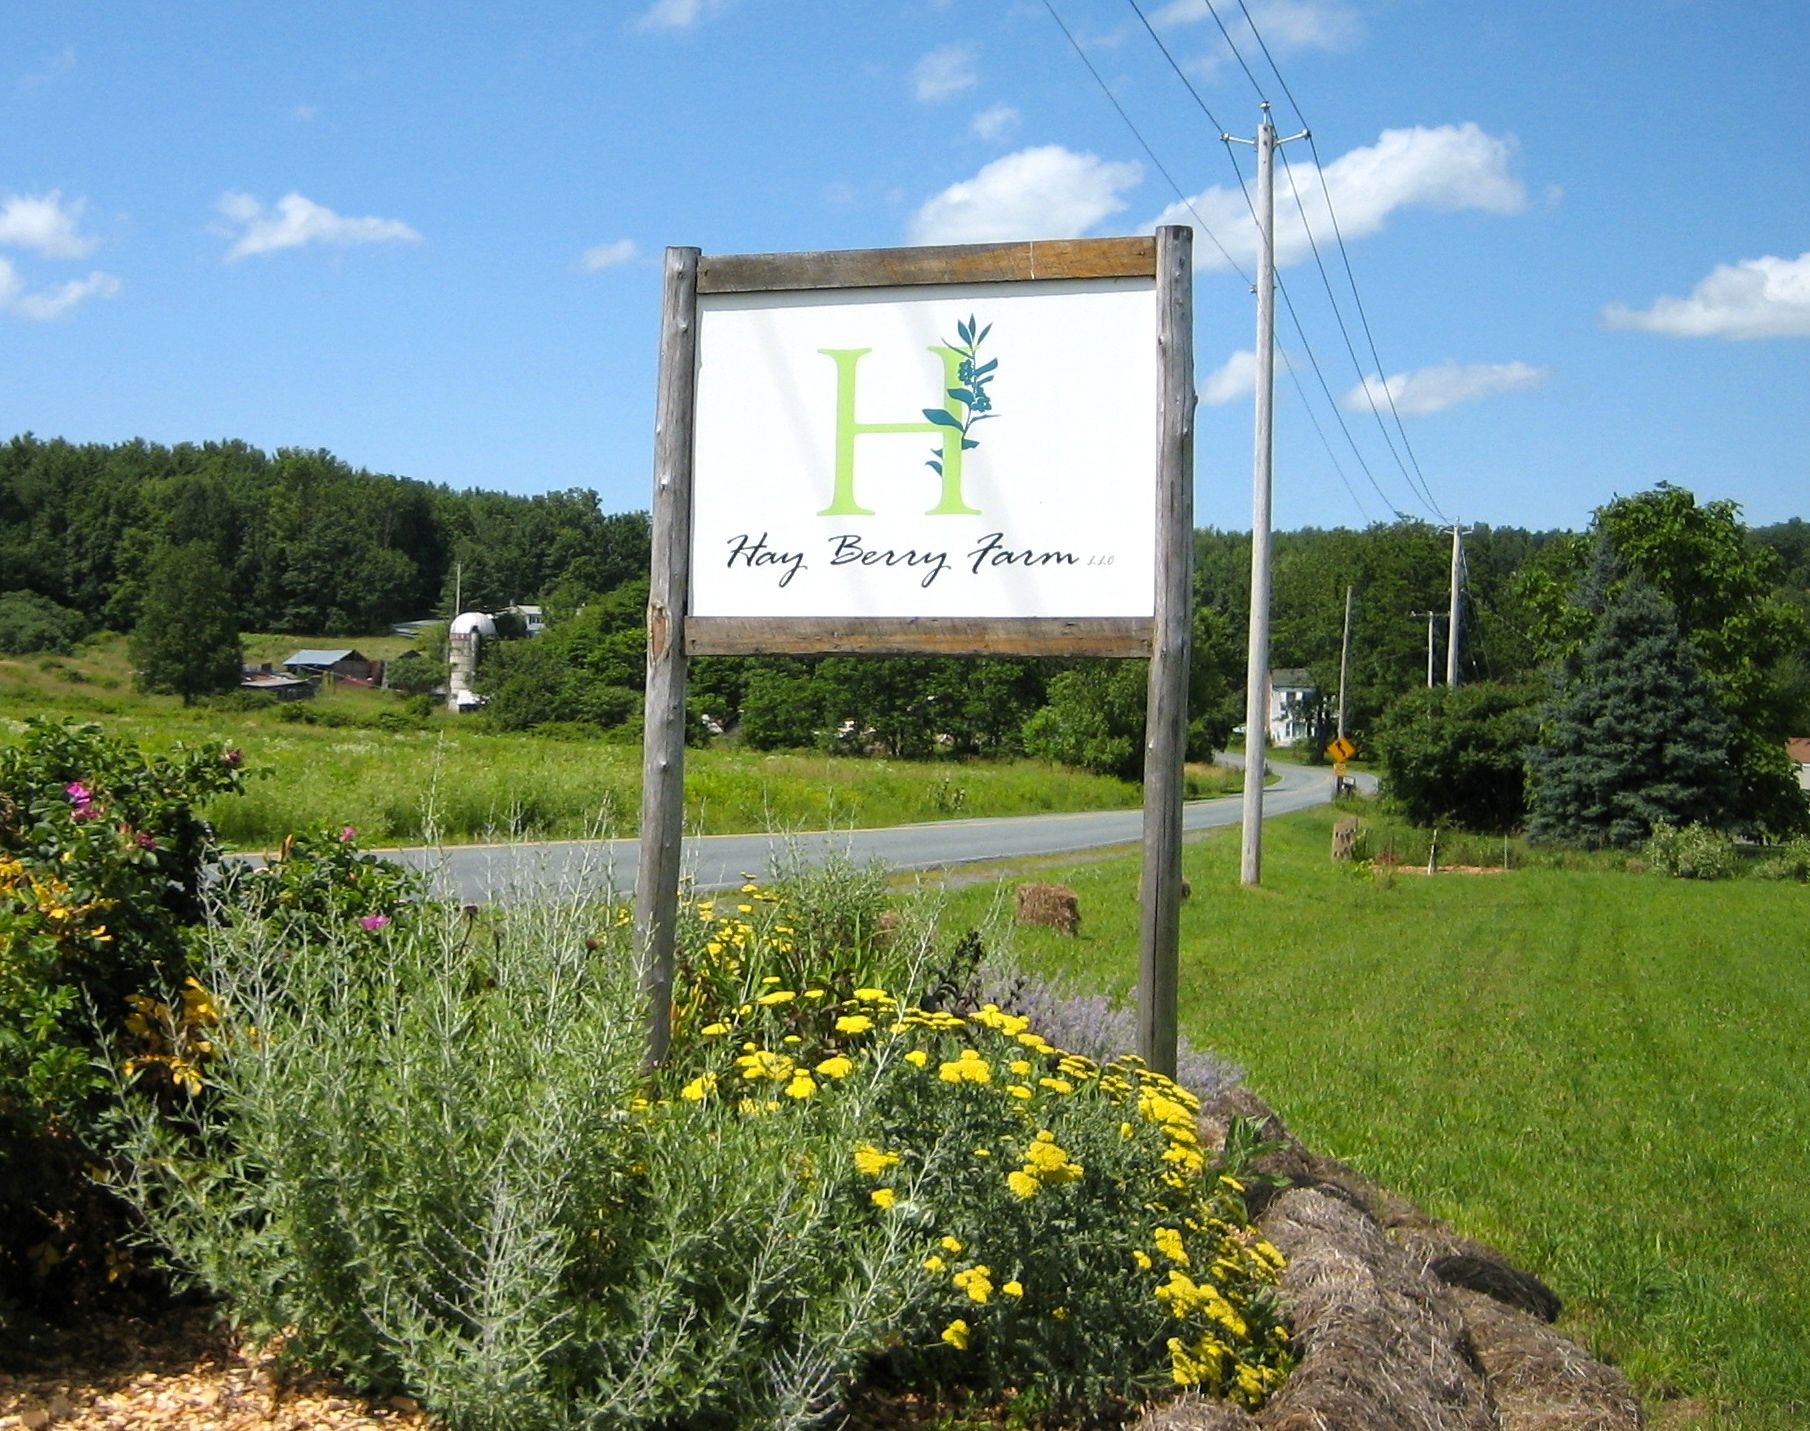 Hay Berry Farm, Hoosick Falls, New York. You pick